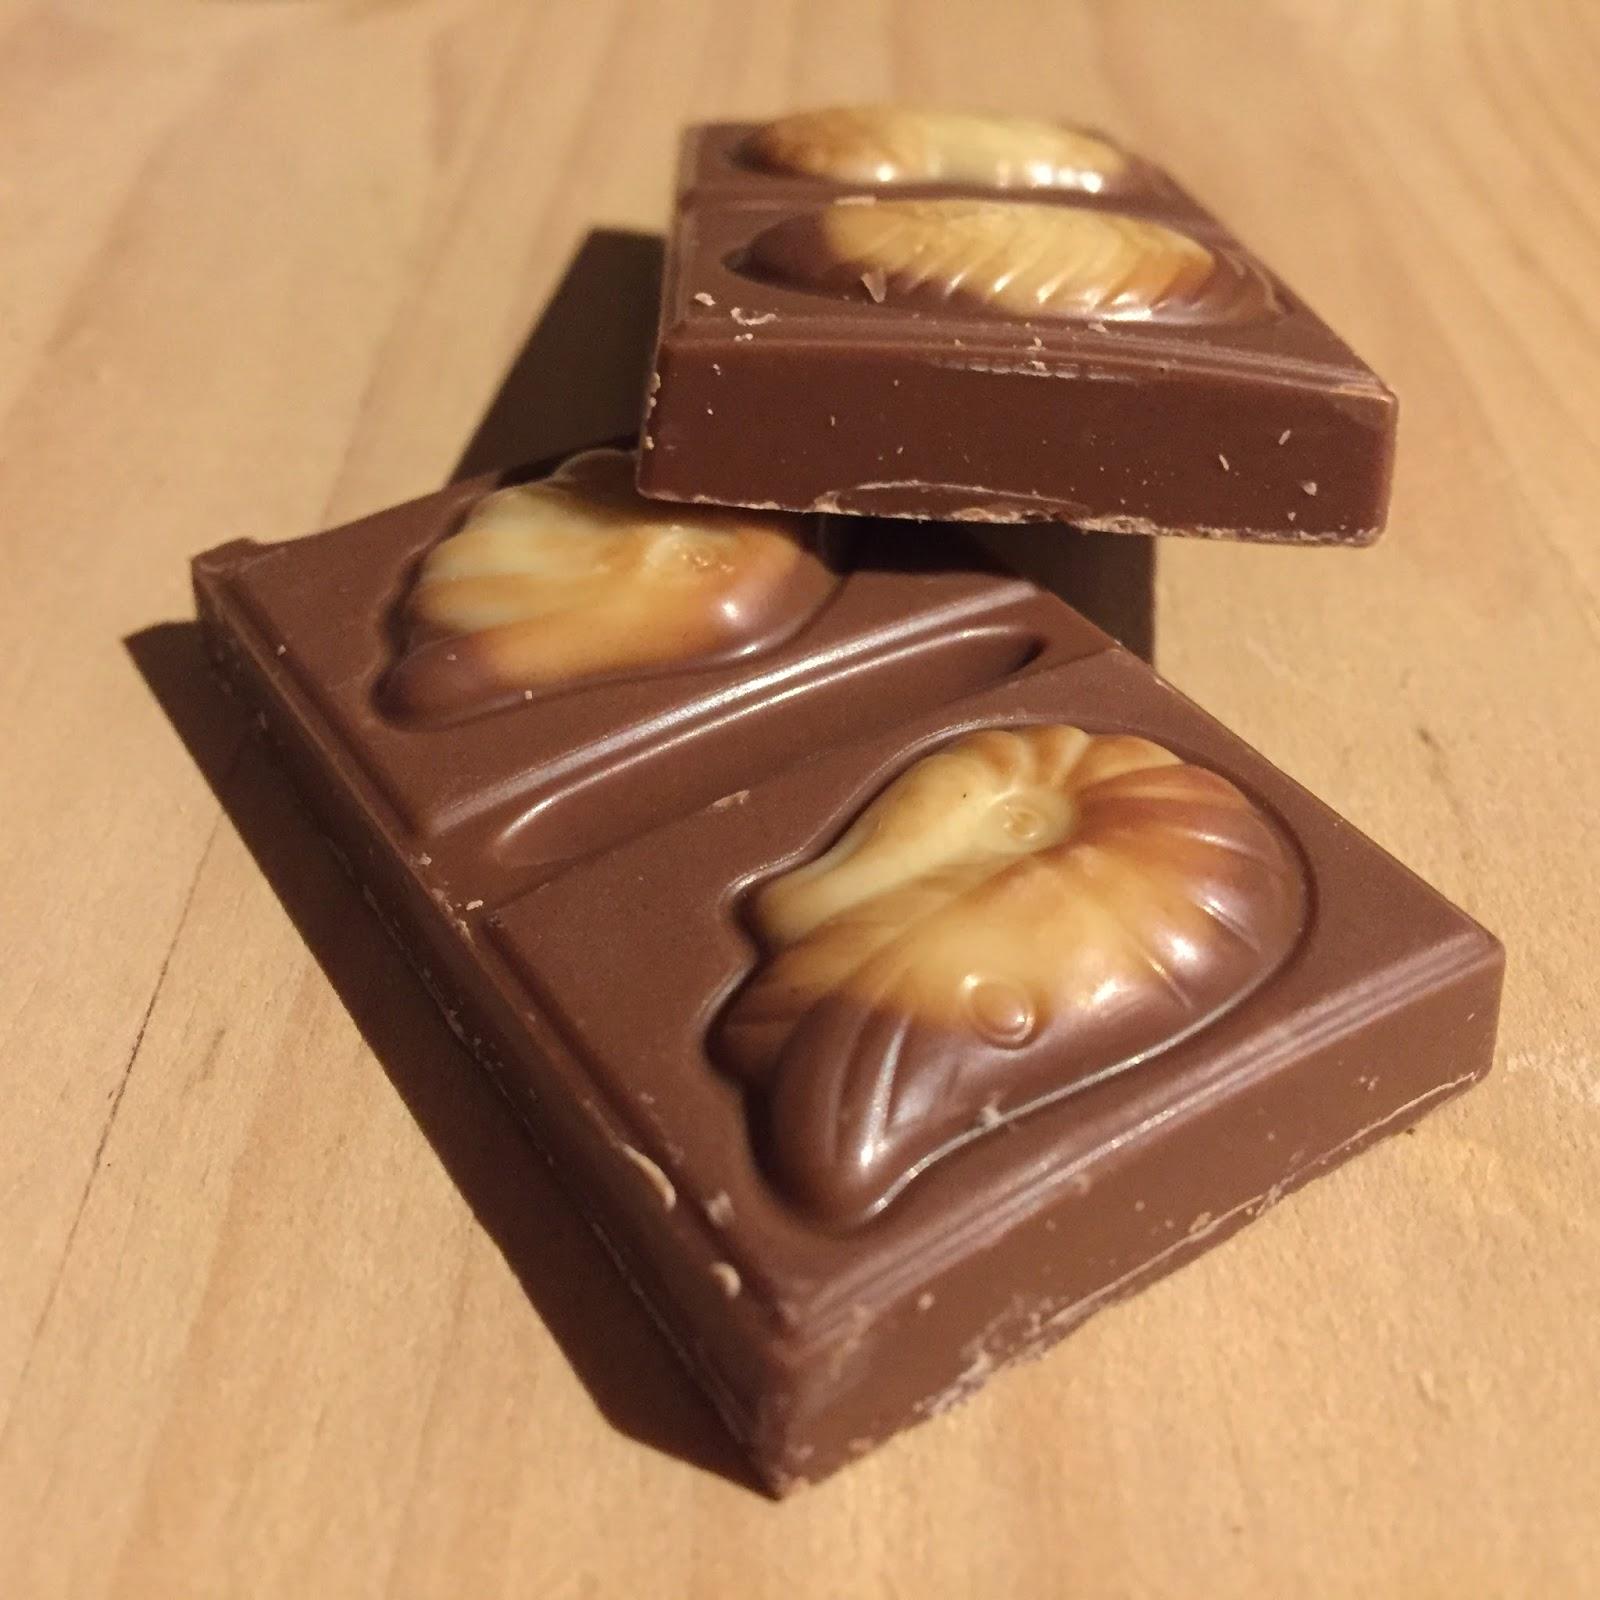 Amy Seeks New Treats: NEW! Guylian Caramel Belgian Chocolate Bar